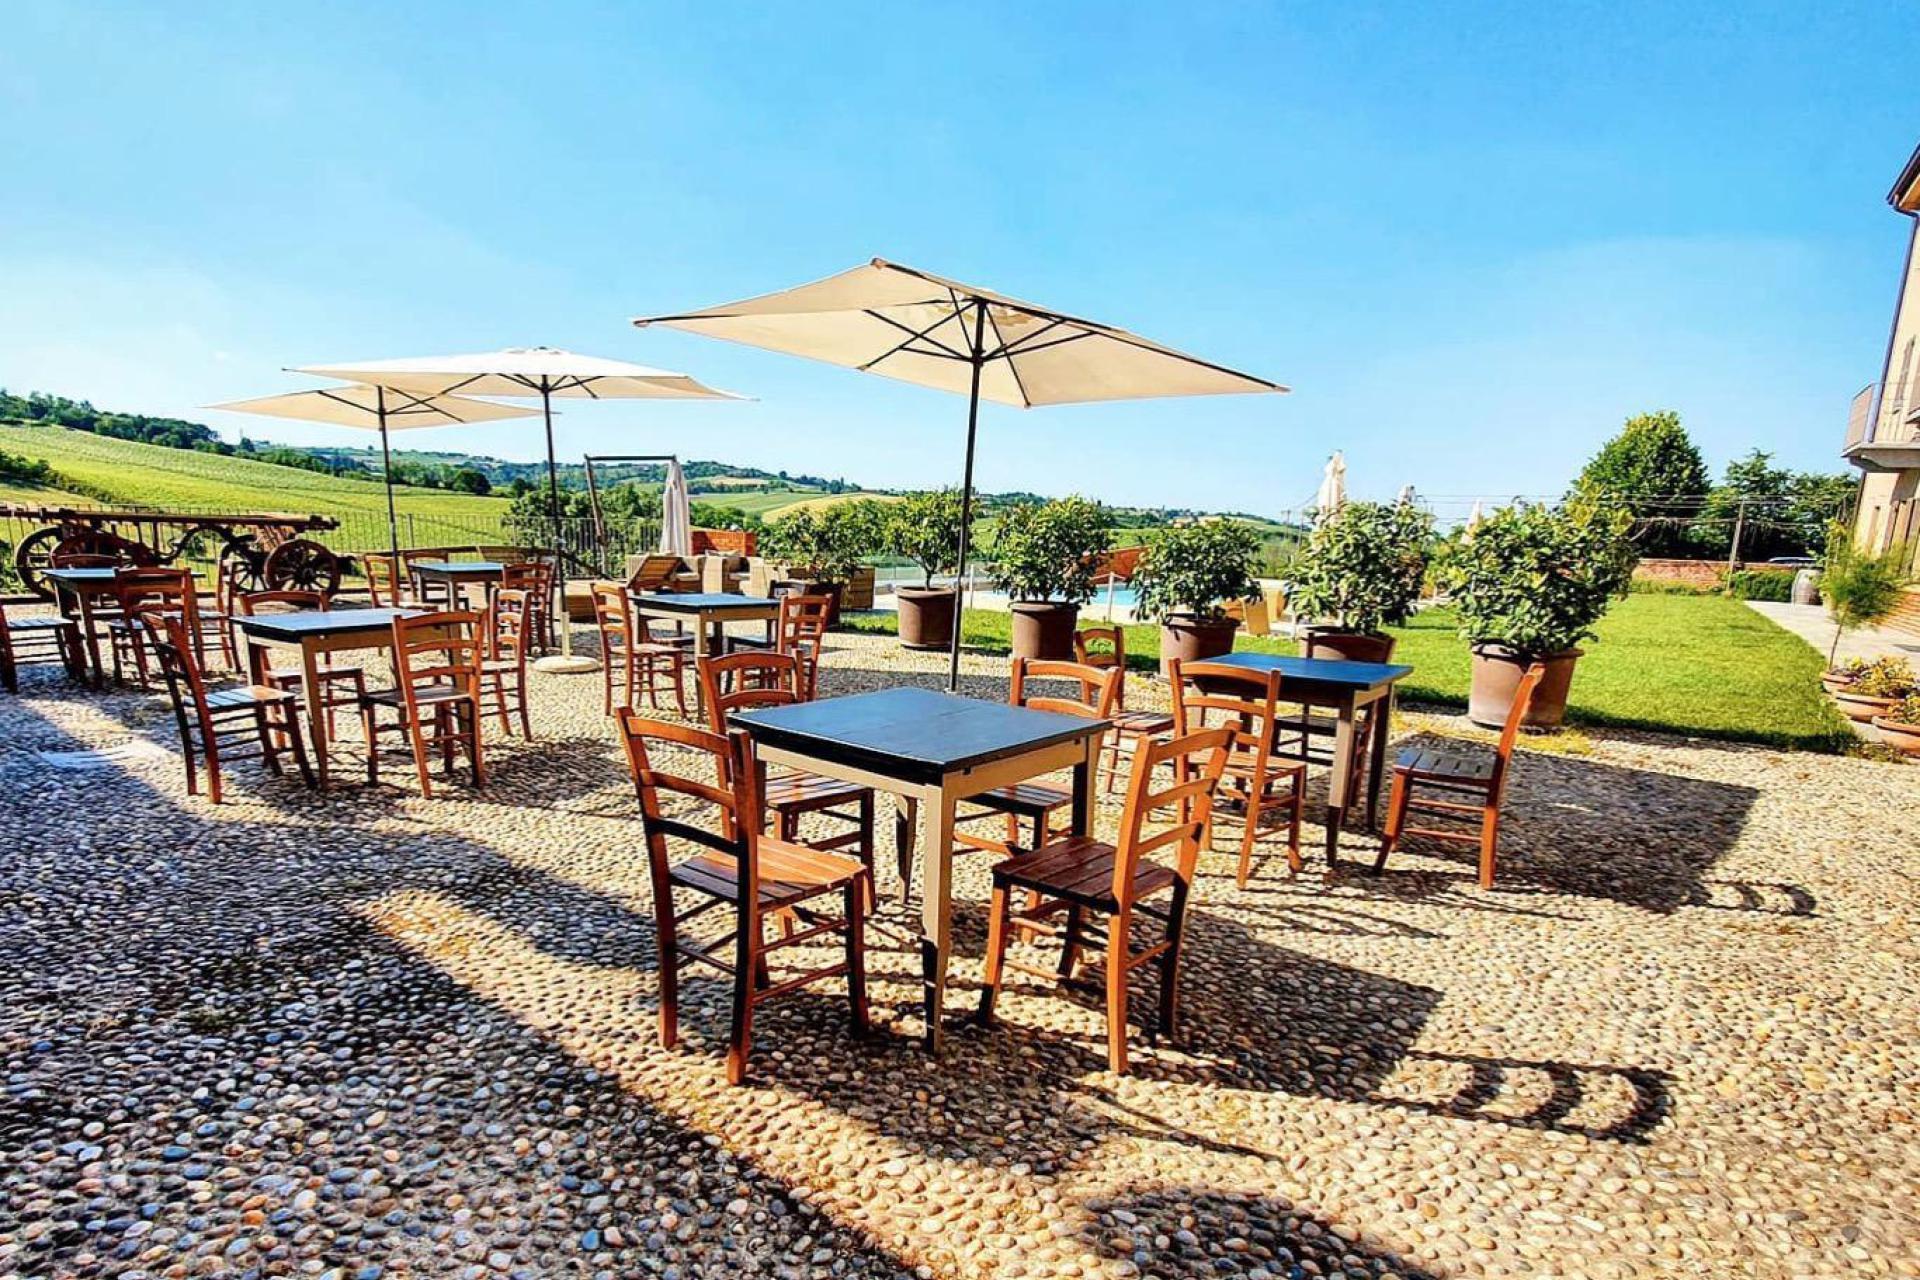 Agriturismo Piemonte Elegante agriturismo in Piemonte voor fijnproevers